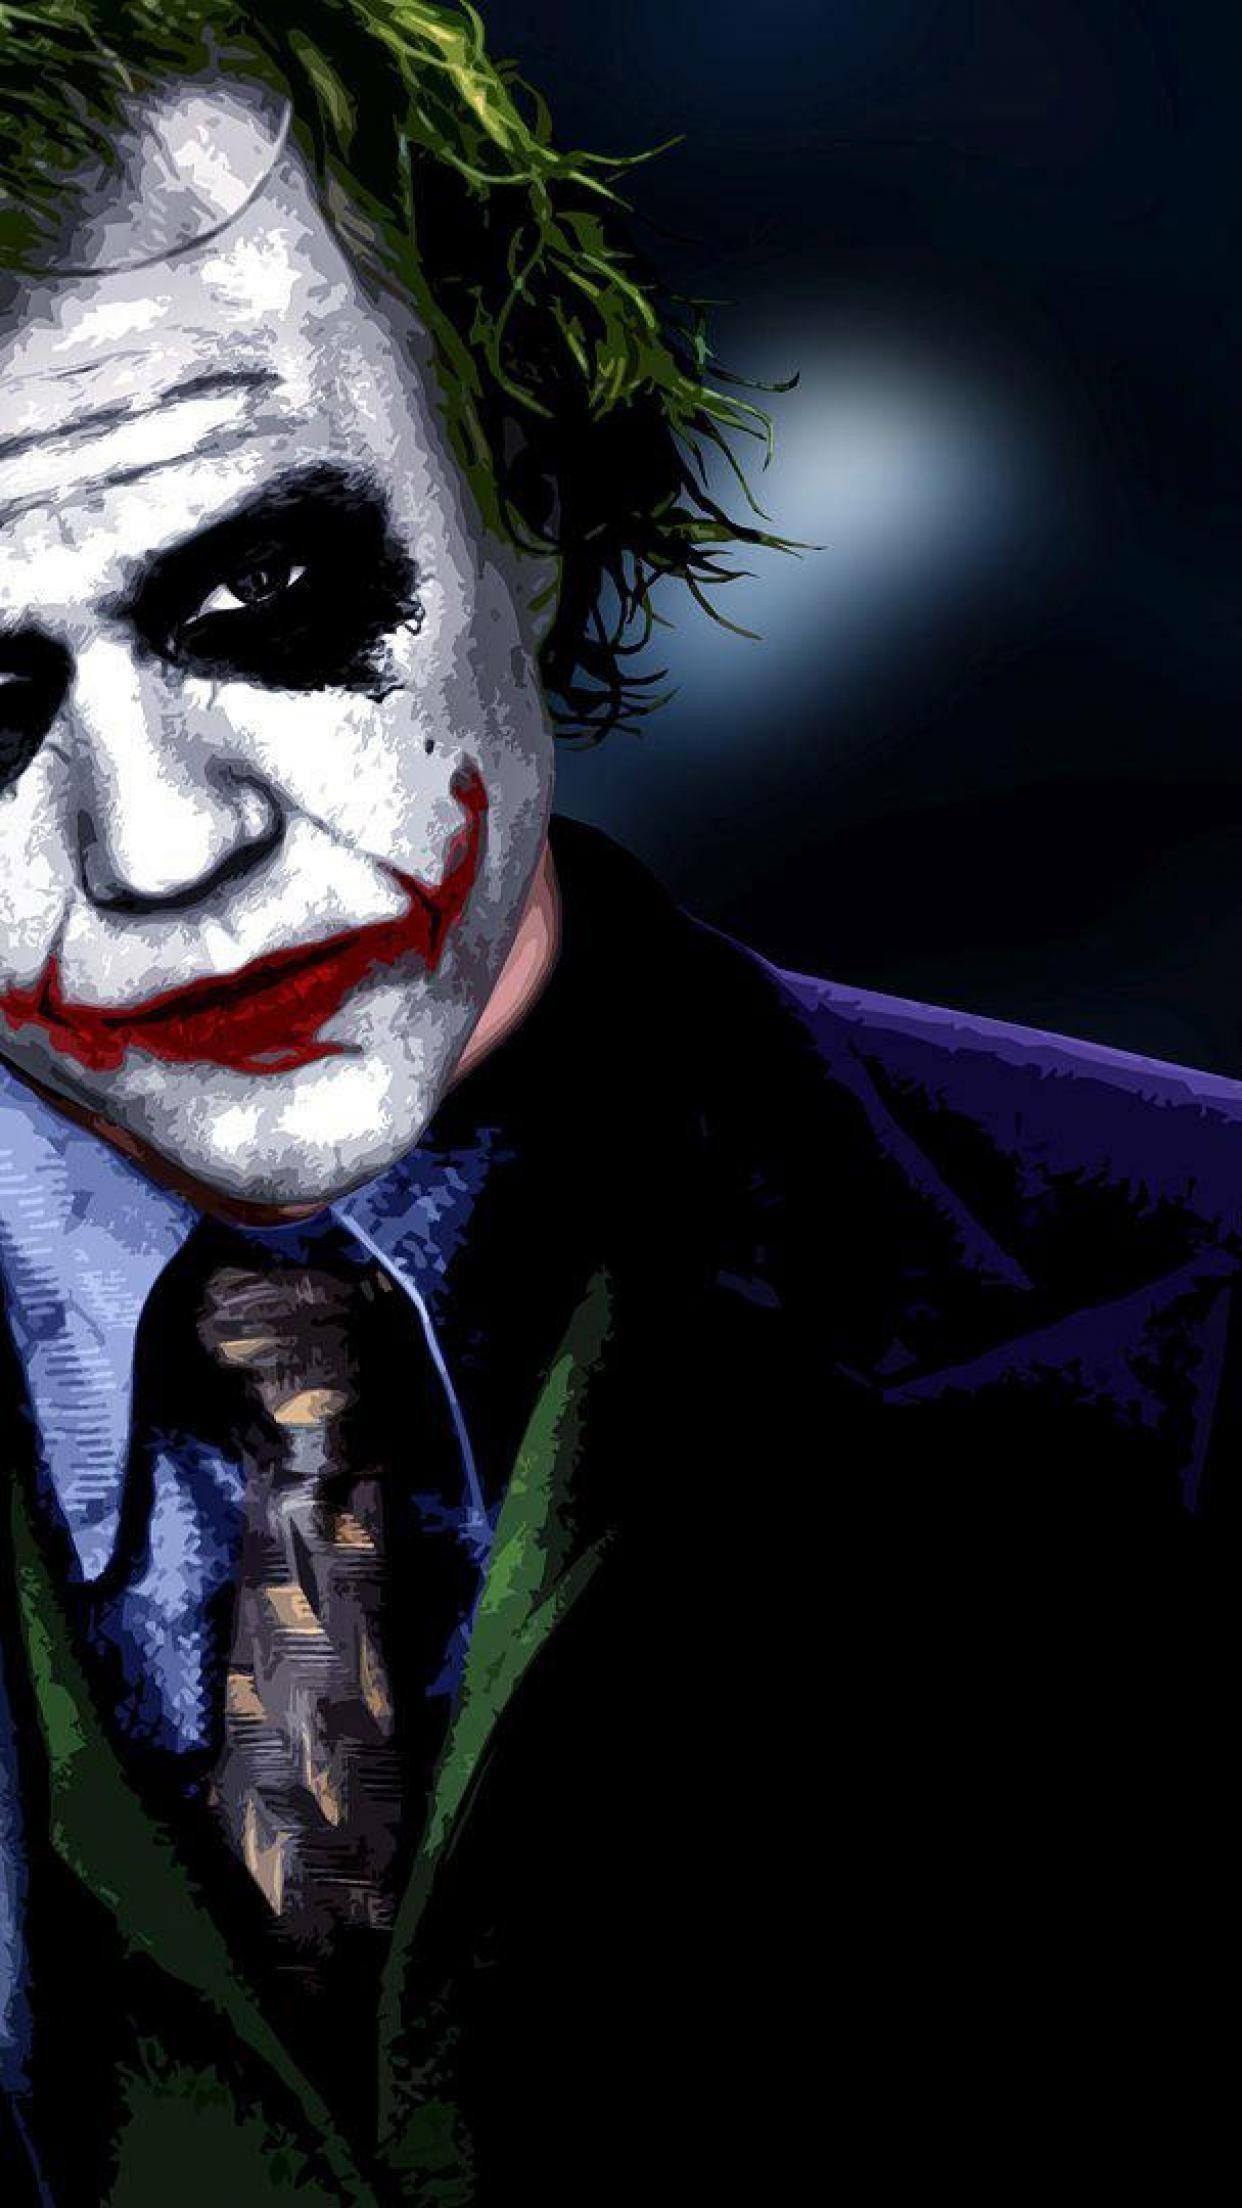 Https Chromedino Com Joker About The Joker Have Already Released An Online Game Look Joker Artwork Joker Wallpapers Joker Iphone Wallpaper